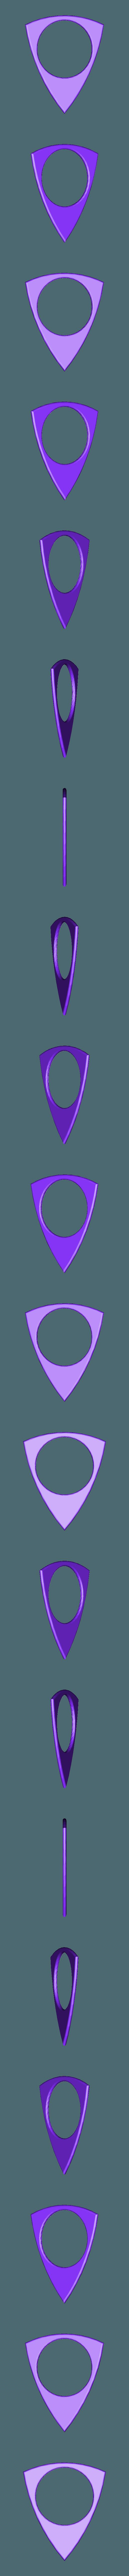 PITA 24102019_1442-9.stl Download free STL file PITA TRI-KAN Nest Pick 26X31mm (Nest Pick Guitar) 251019-2356 • 3D printing template, carleslluisar